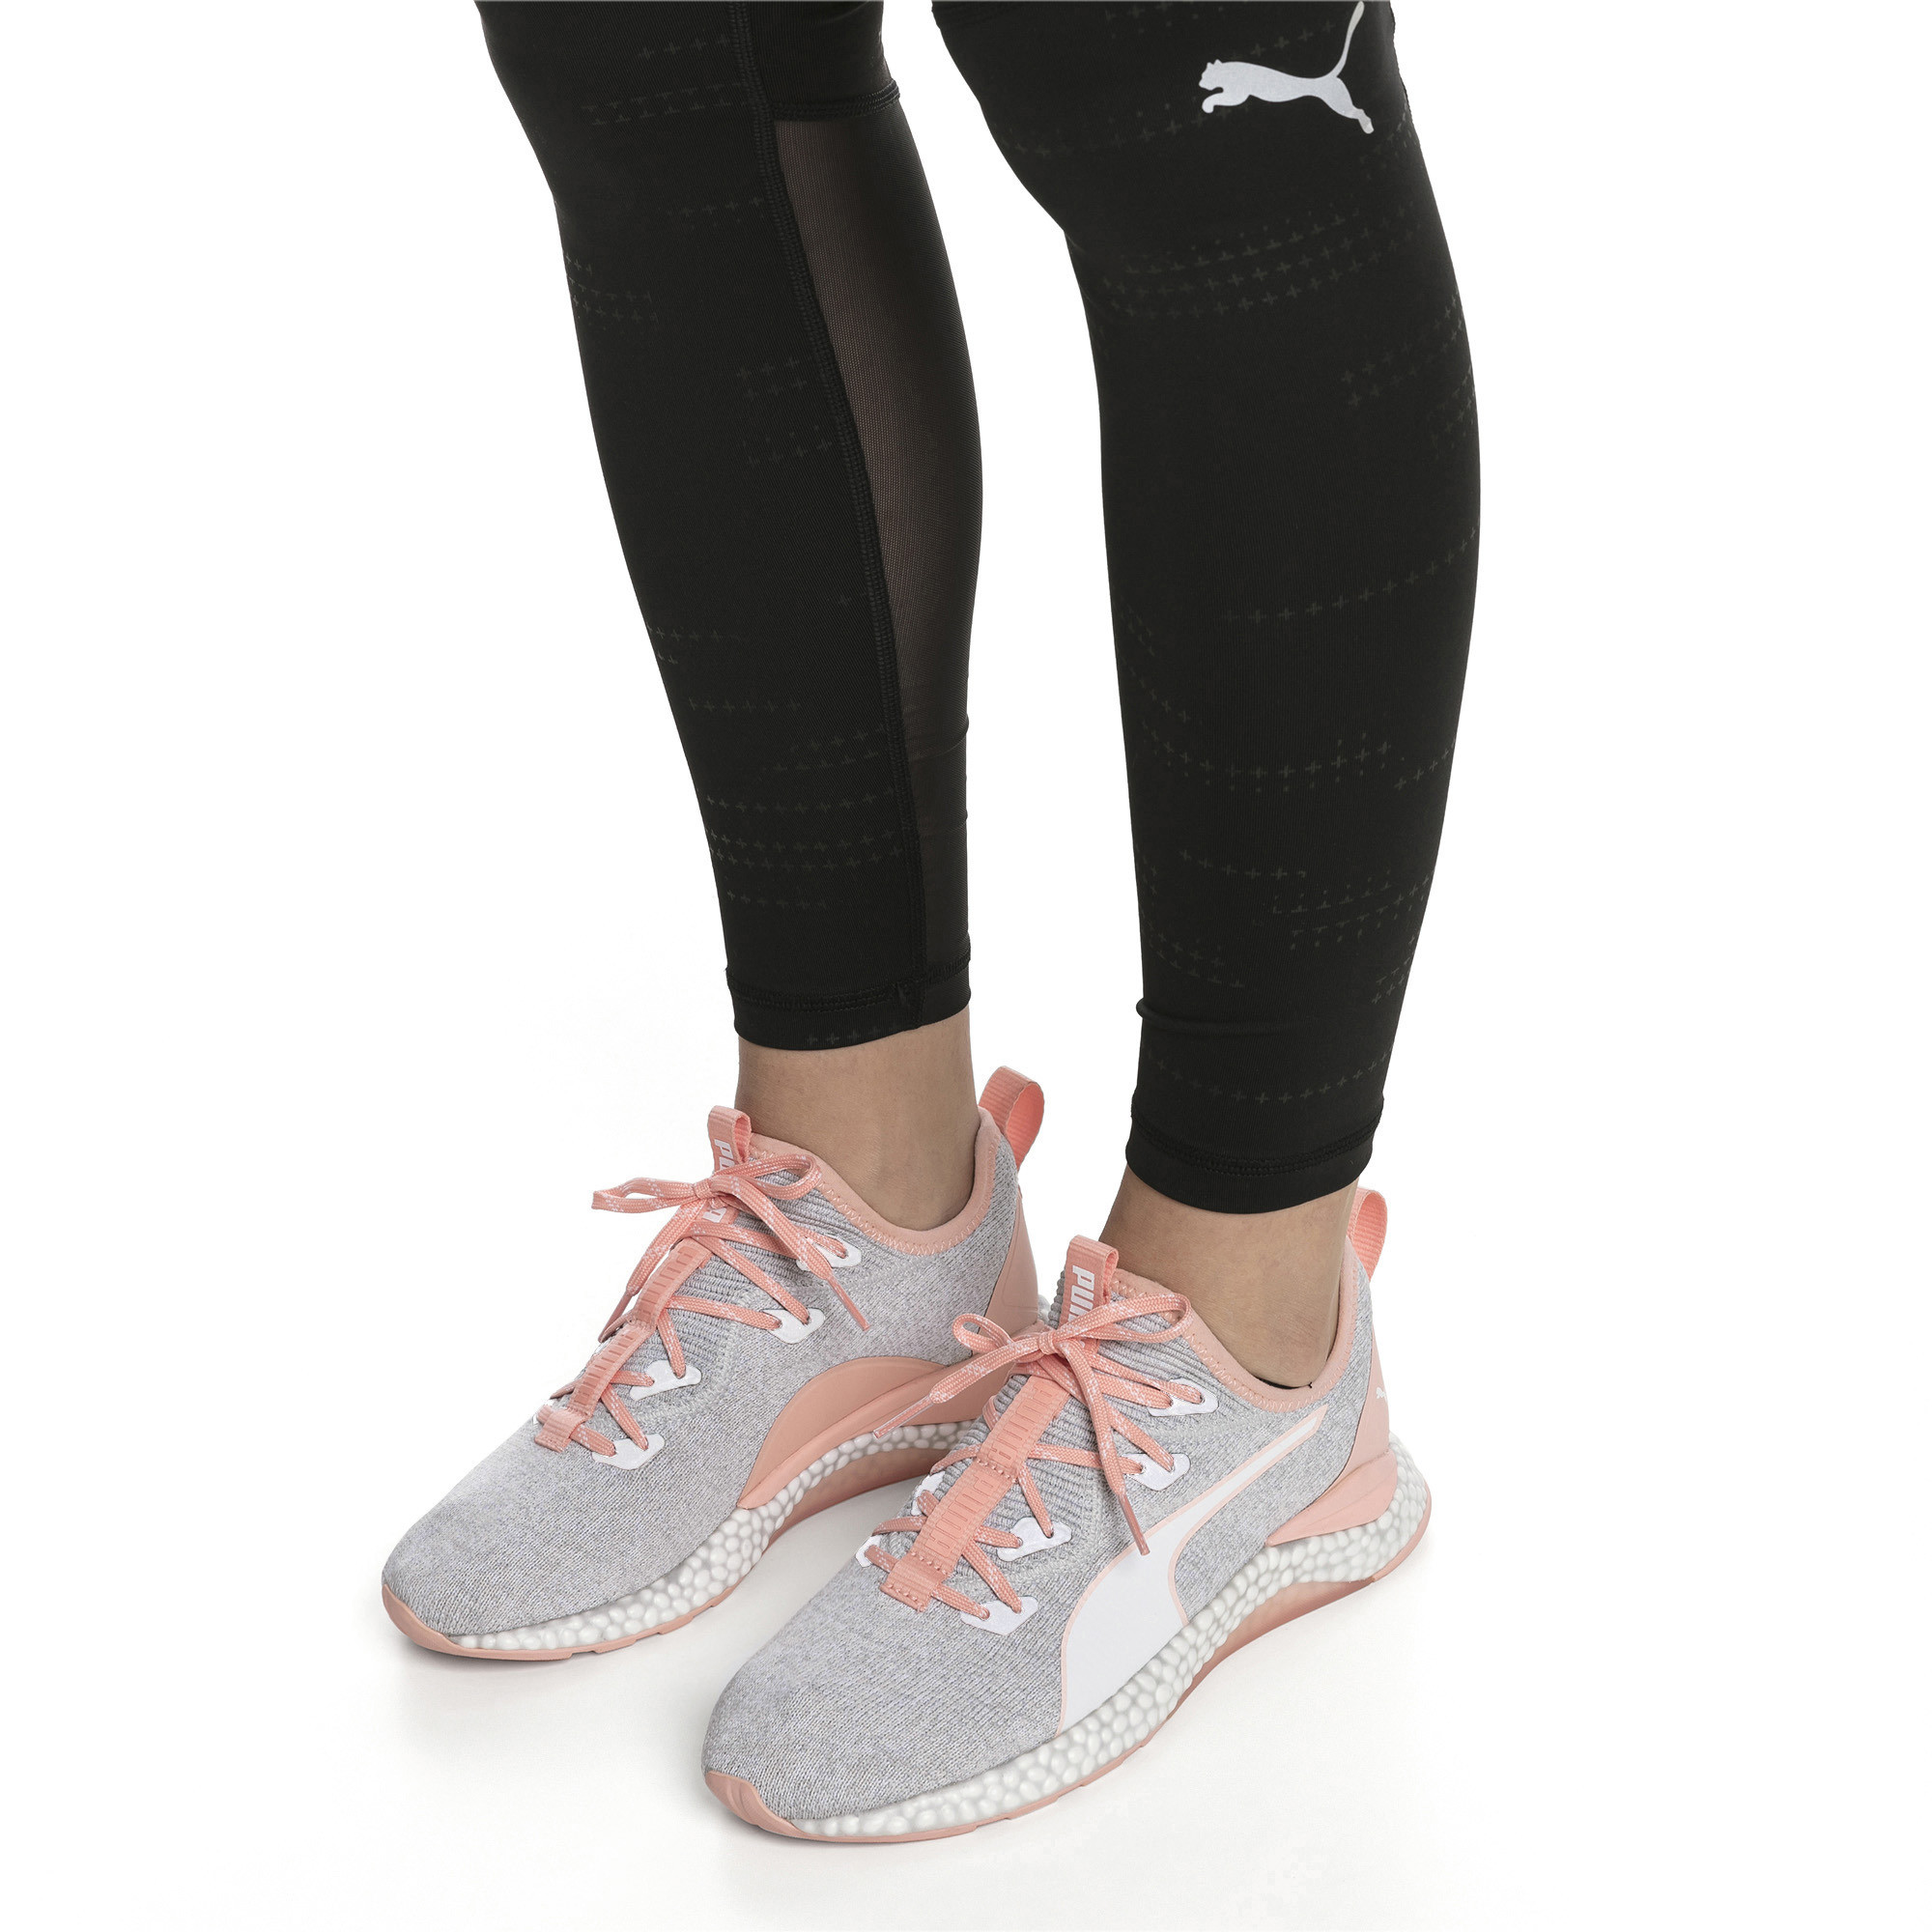 Image Puma Hybrid Runner Women's Running Shoes #2